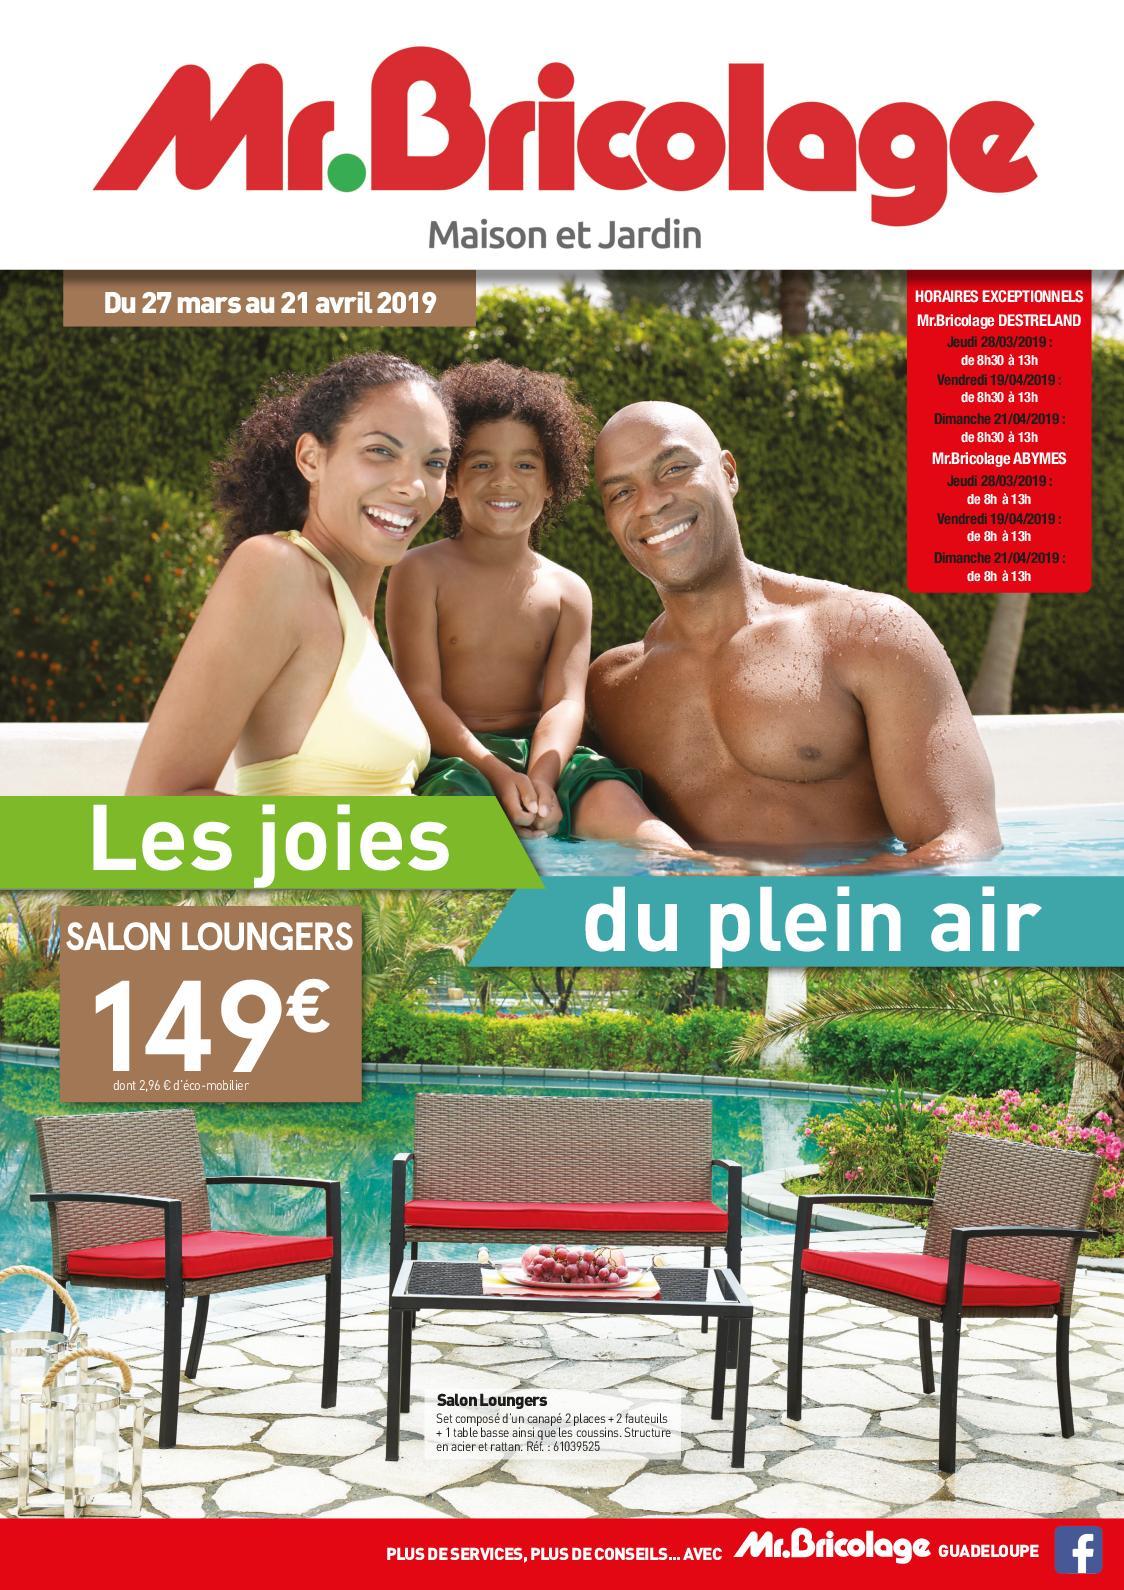 Calaméo - Mr Bricolage Guadeloupe - Catalogue Plein Air 2019